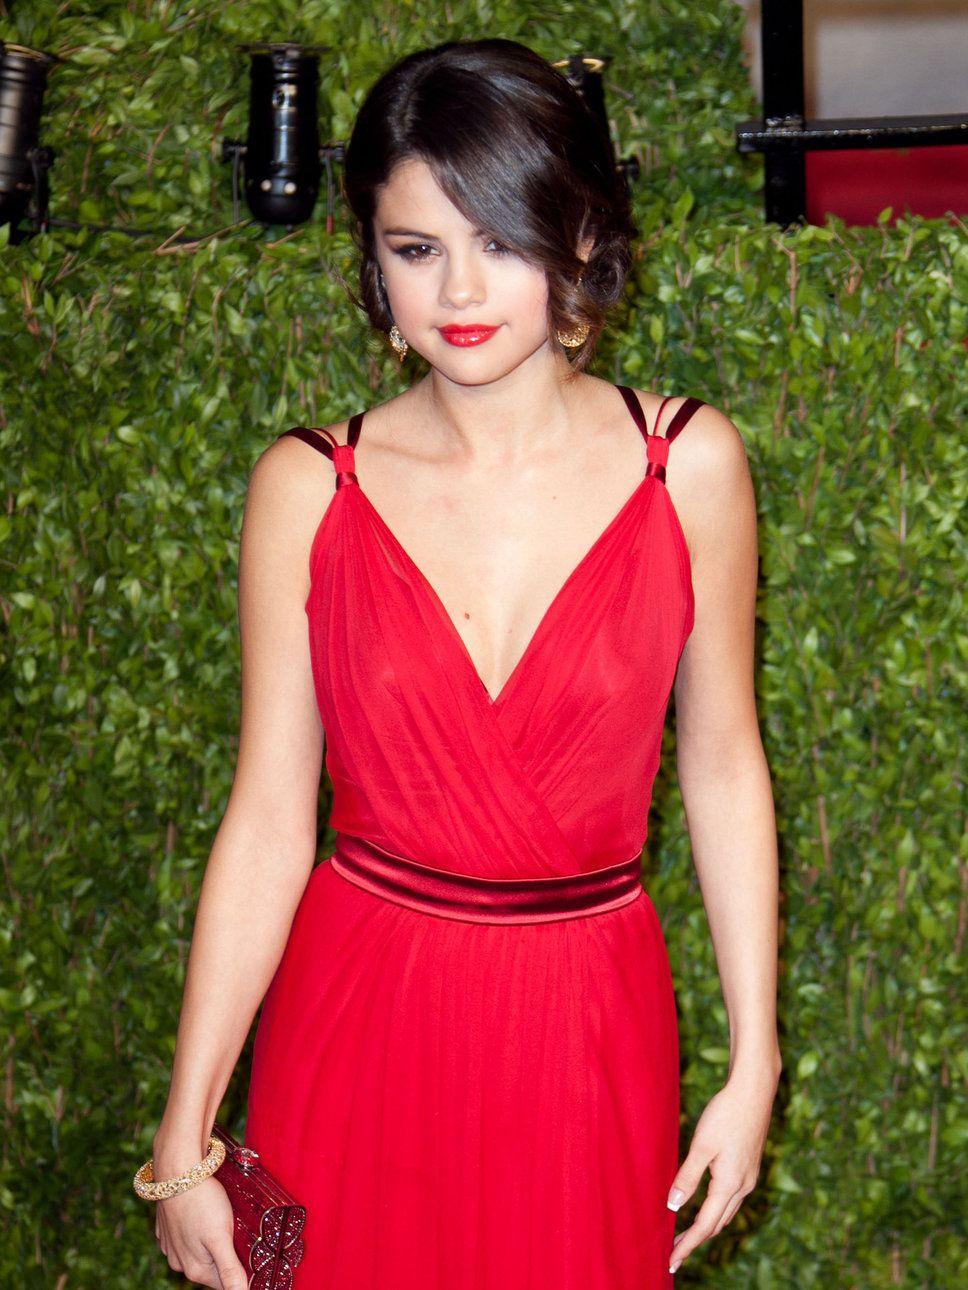 My Celebrity Style Inspiration: Selena Gomez | A Journey to a New ...